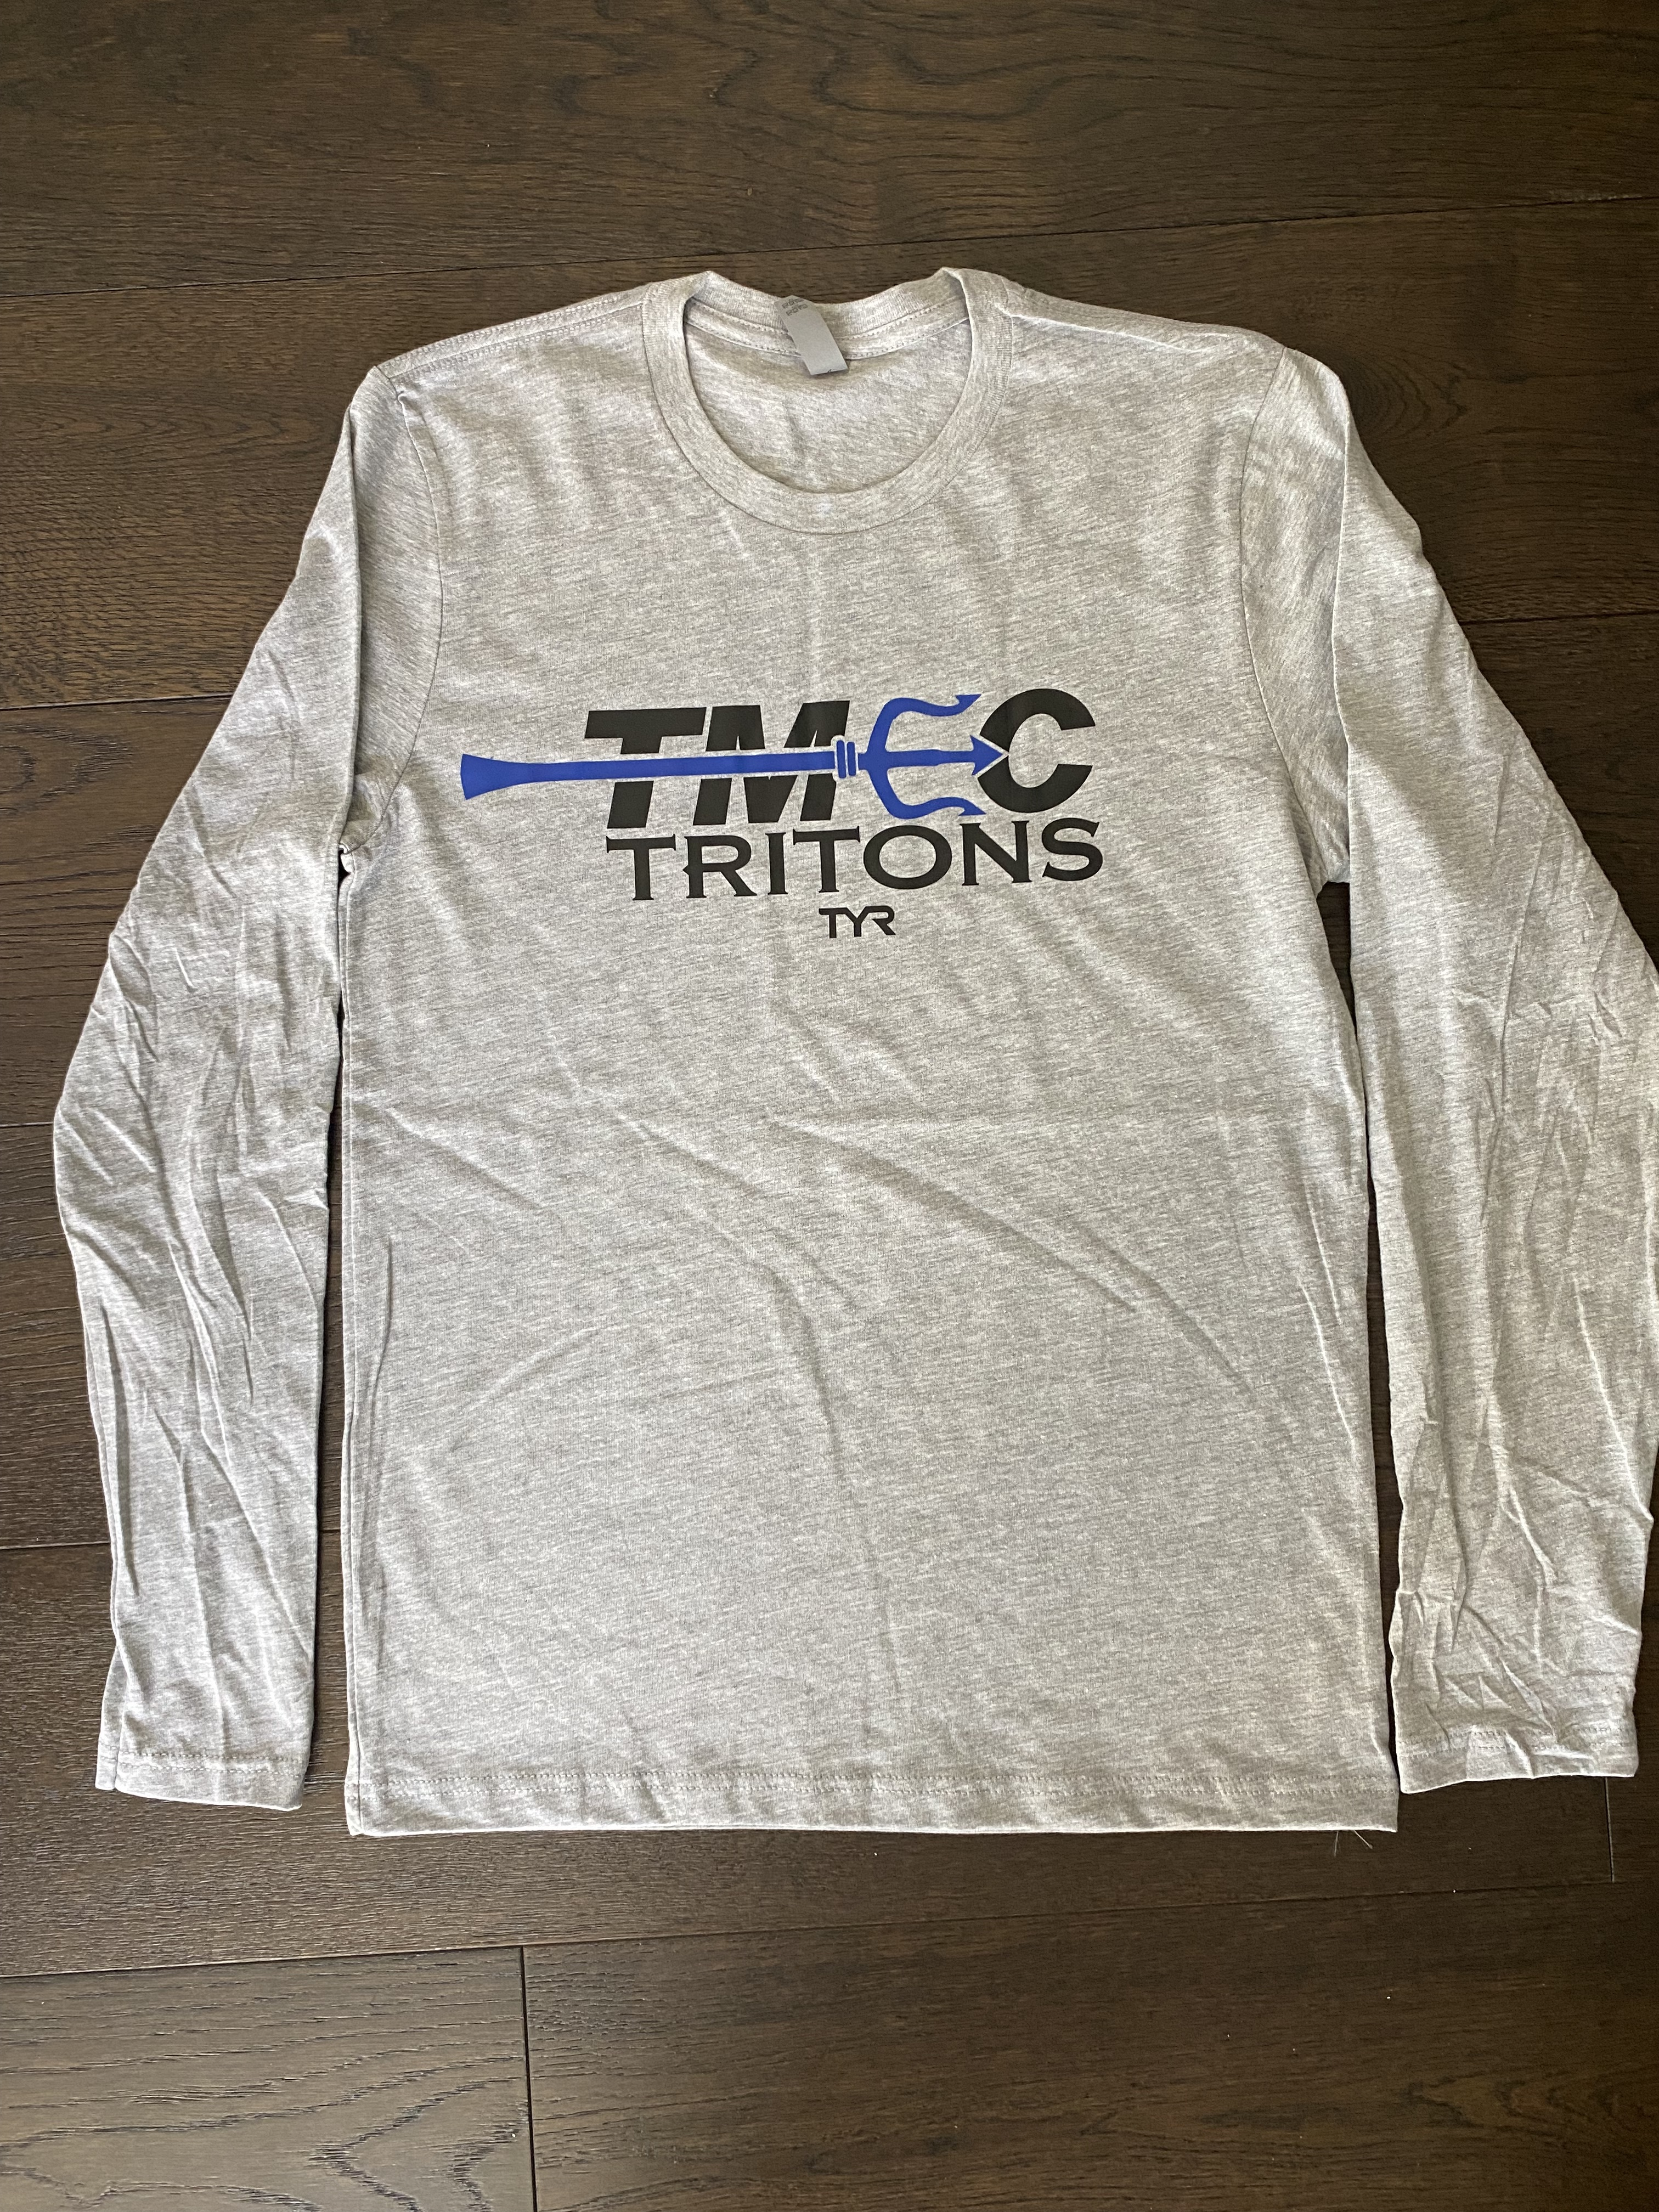 NEXT LEVEL TMEC Long Sleeve Shirt – GRAY